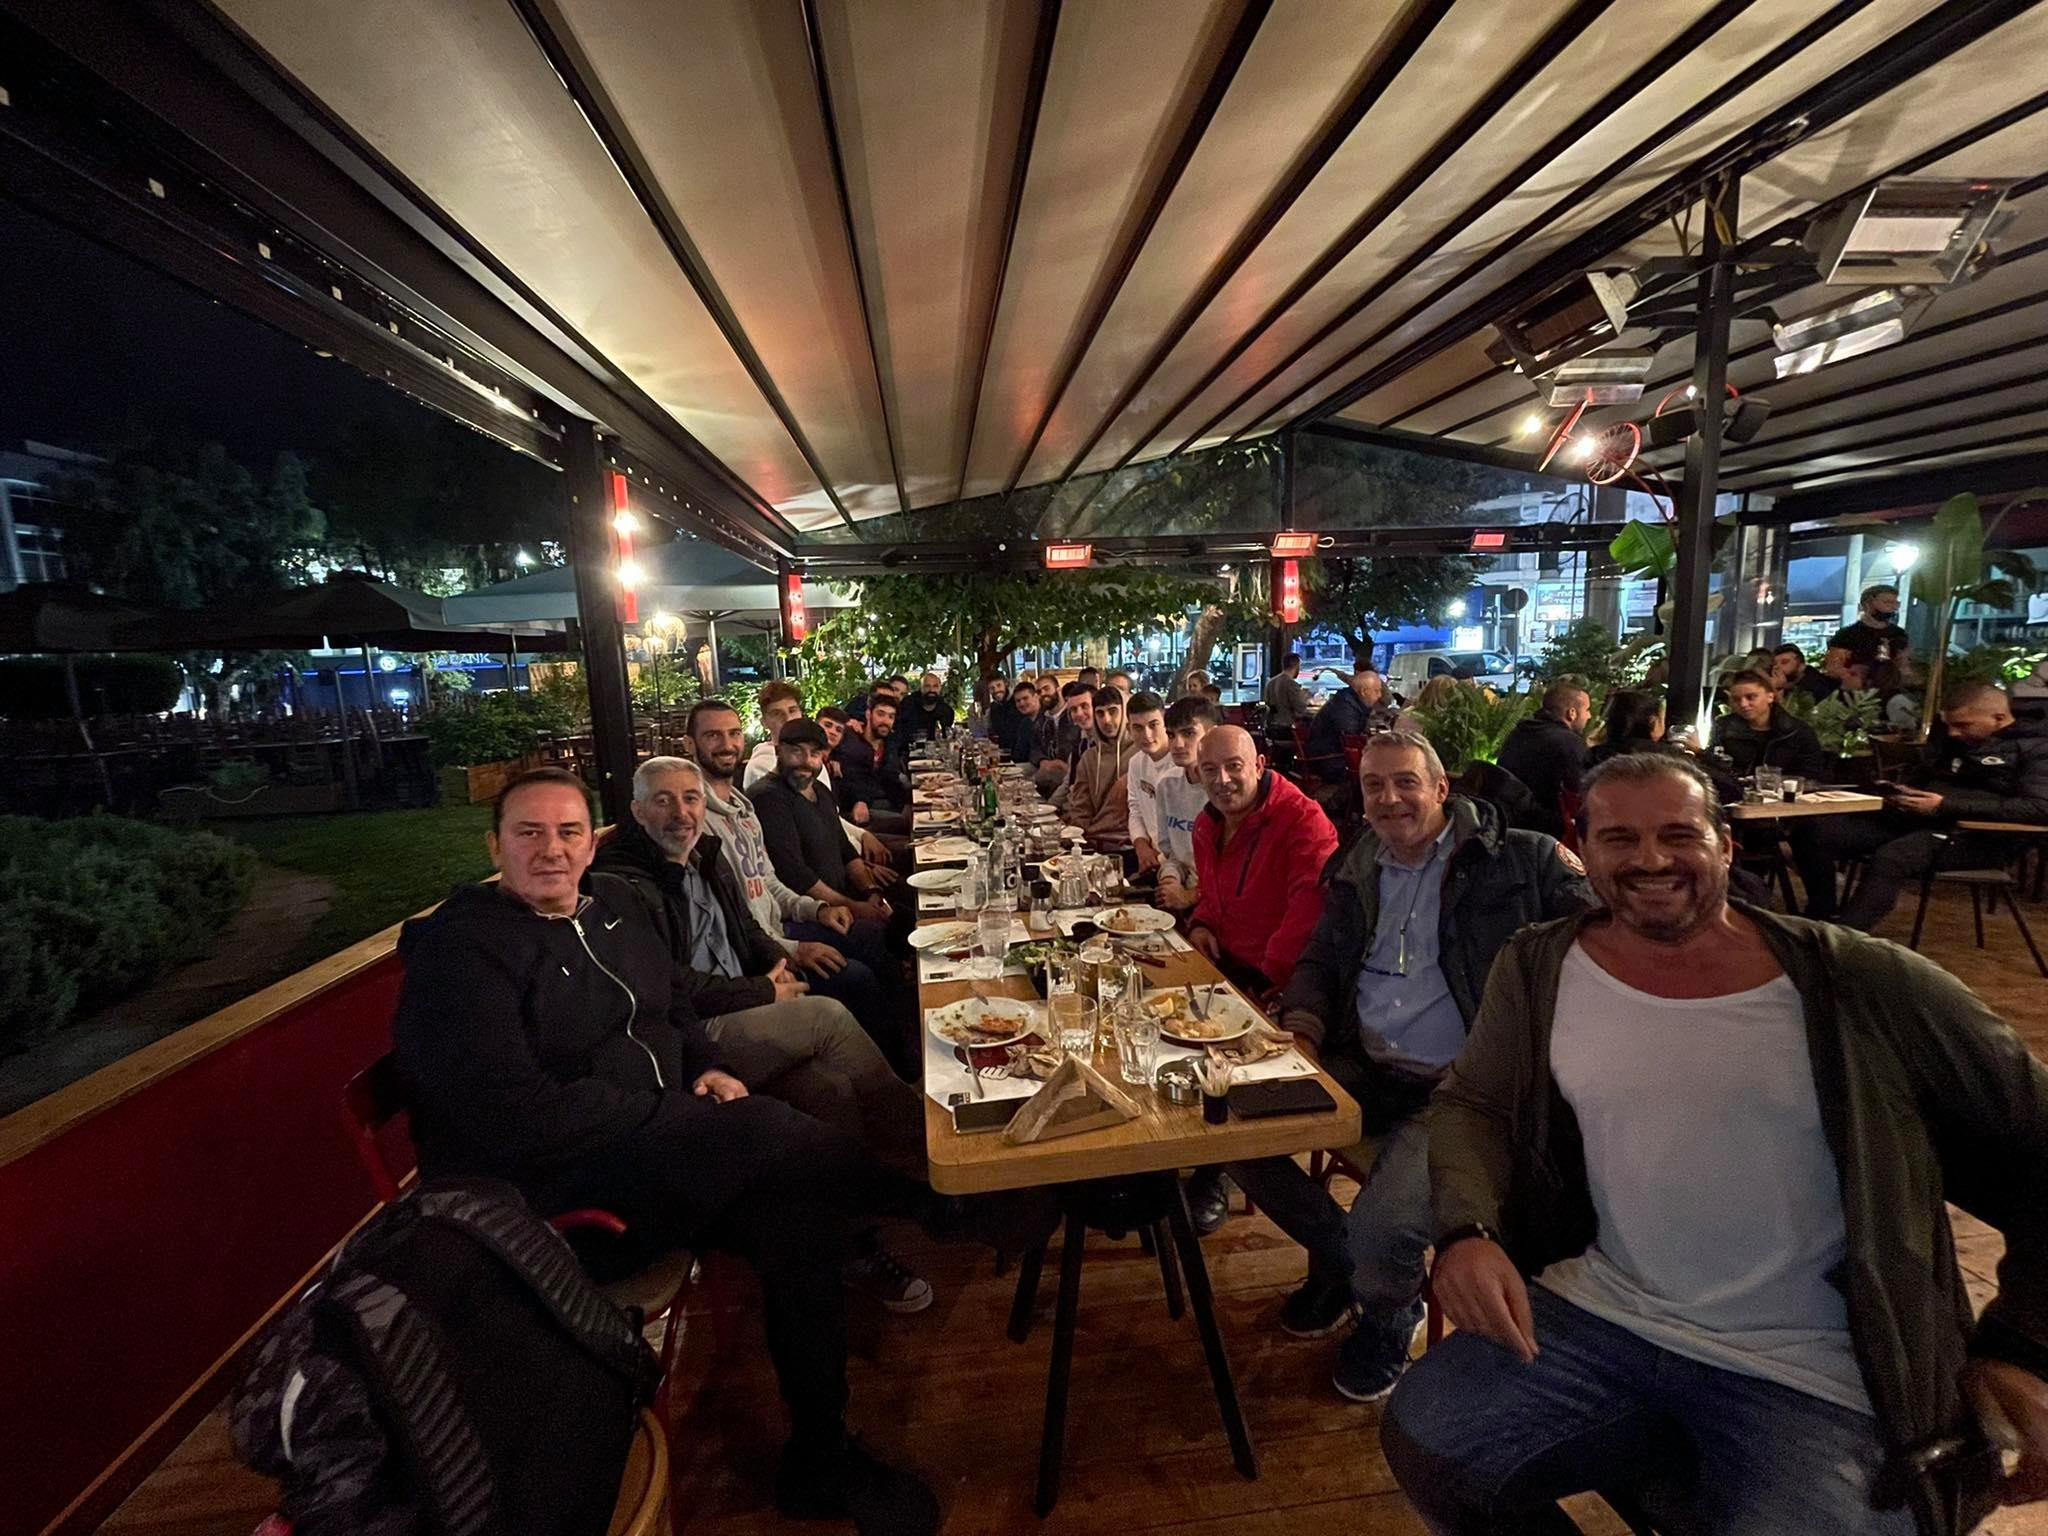 IΣτιγμές χαλάρωσης για τους Άνδρες της Ένωσης Ιλίου στο Enzzo Cook Bar!